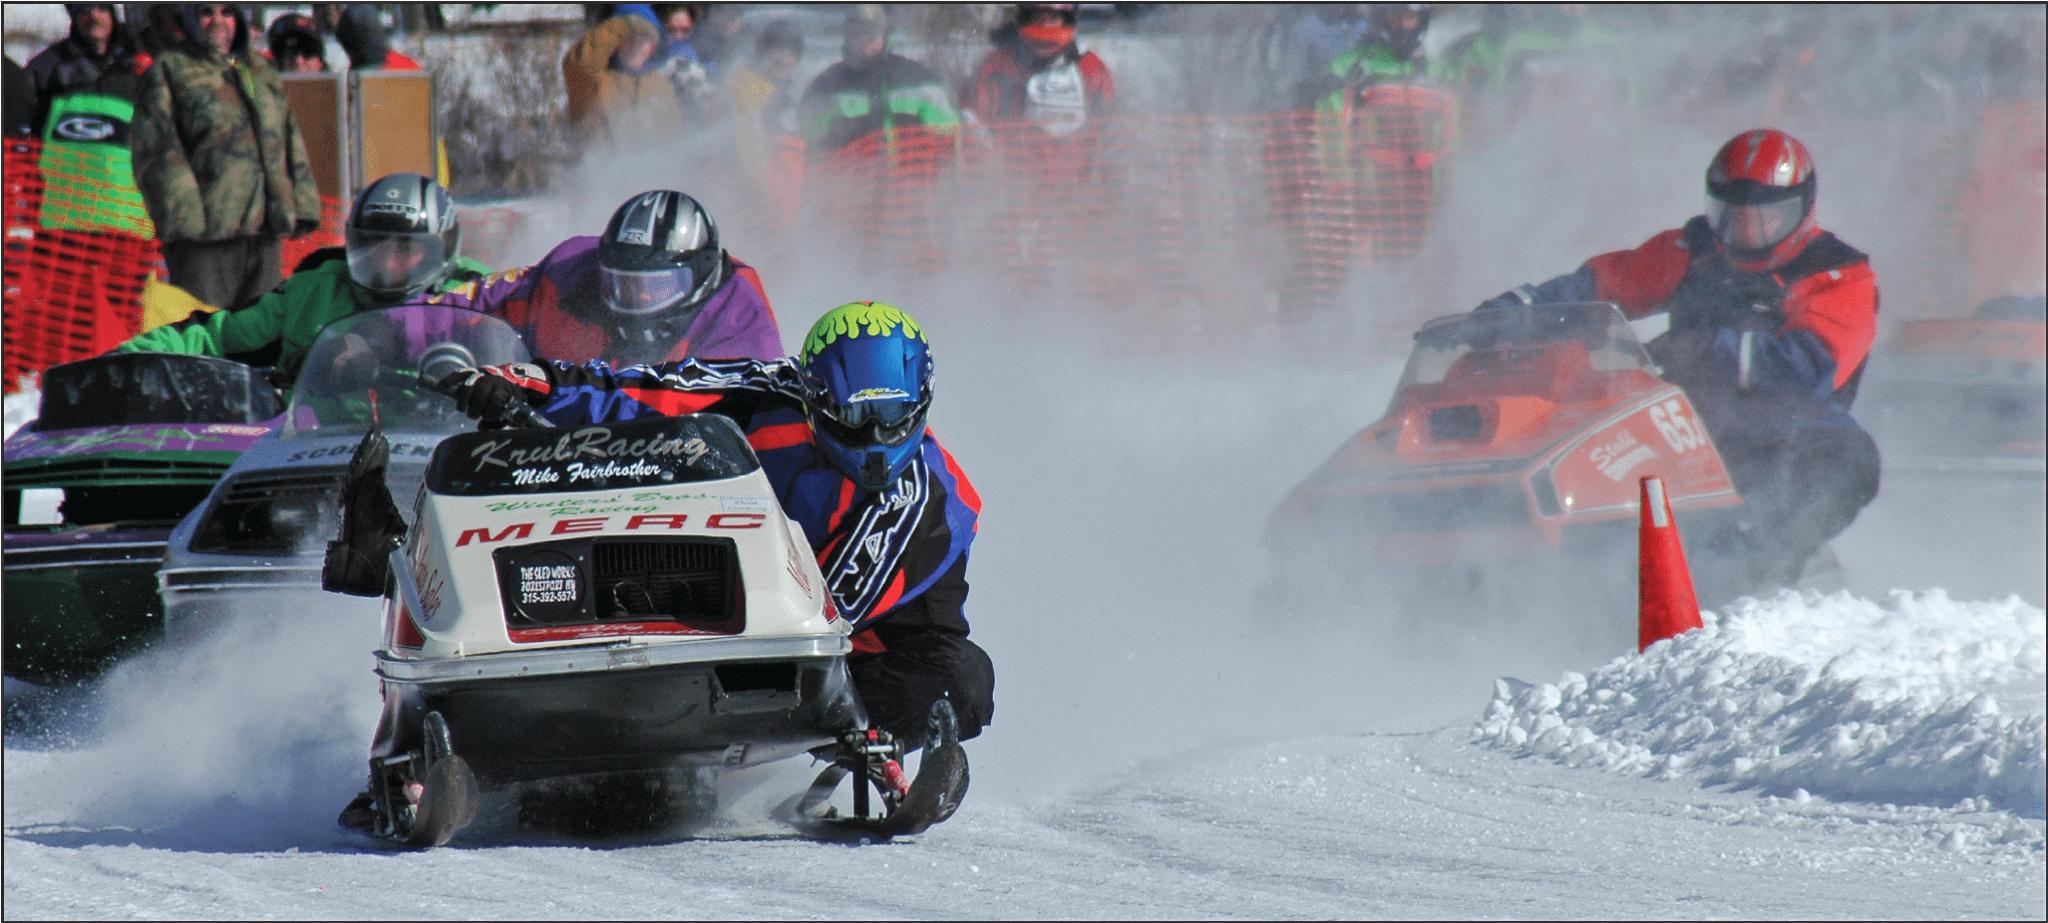 Amateur snowmobile racing